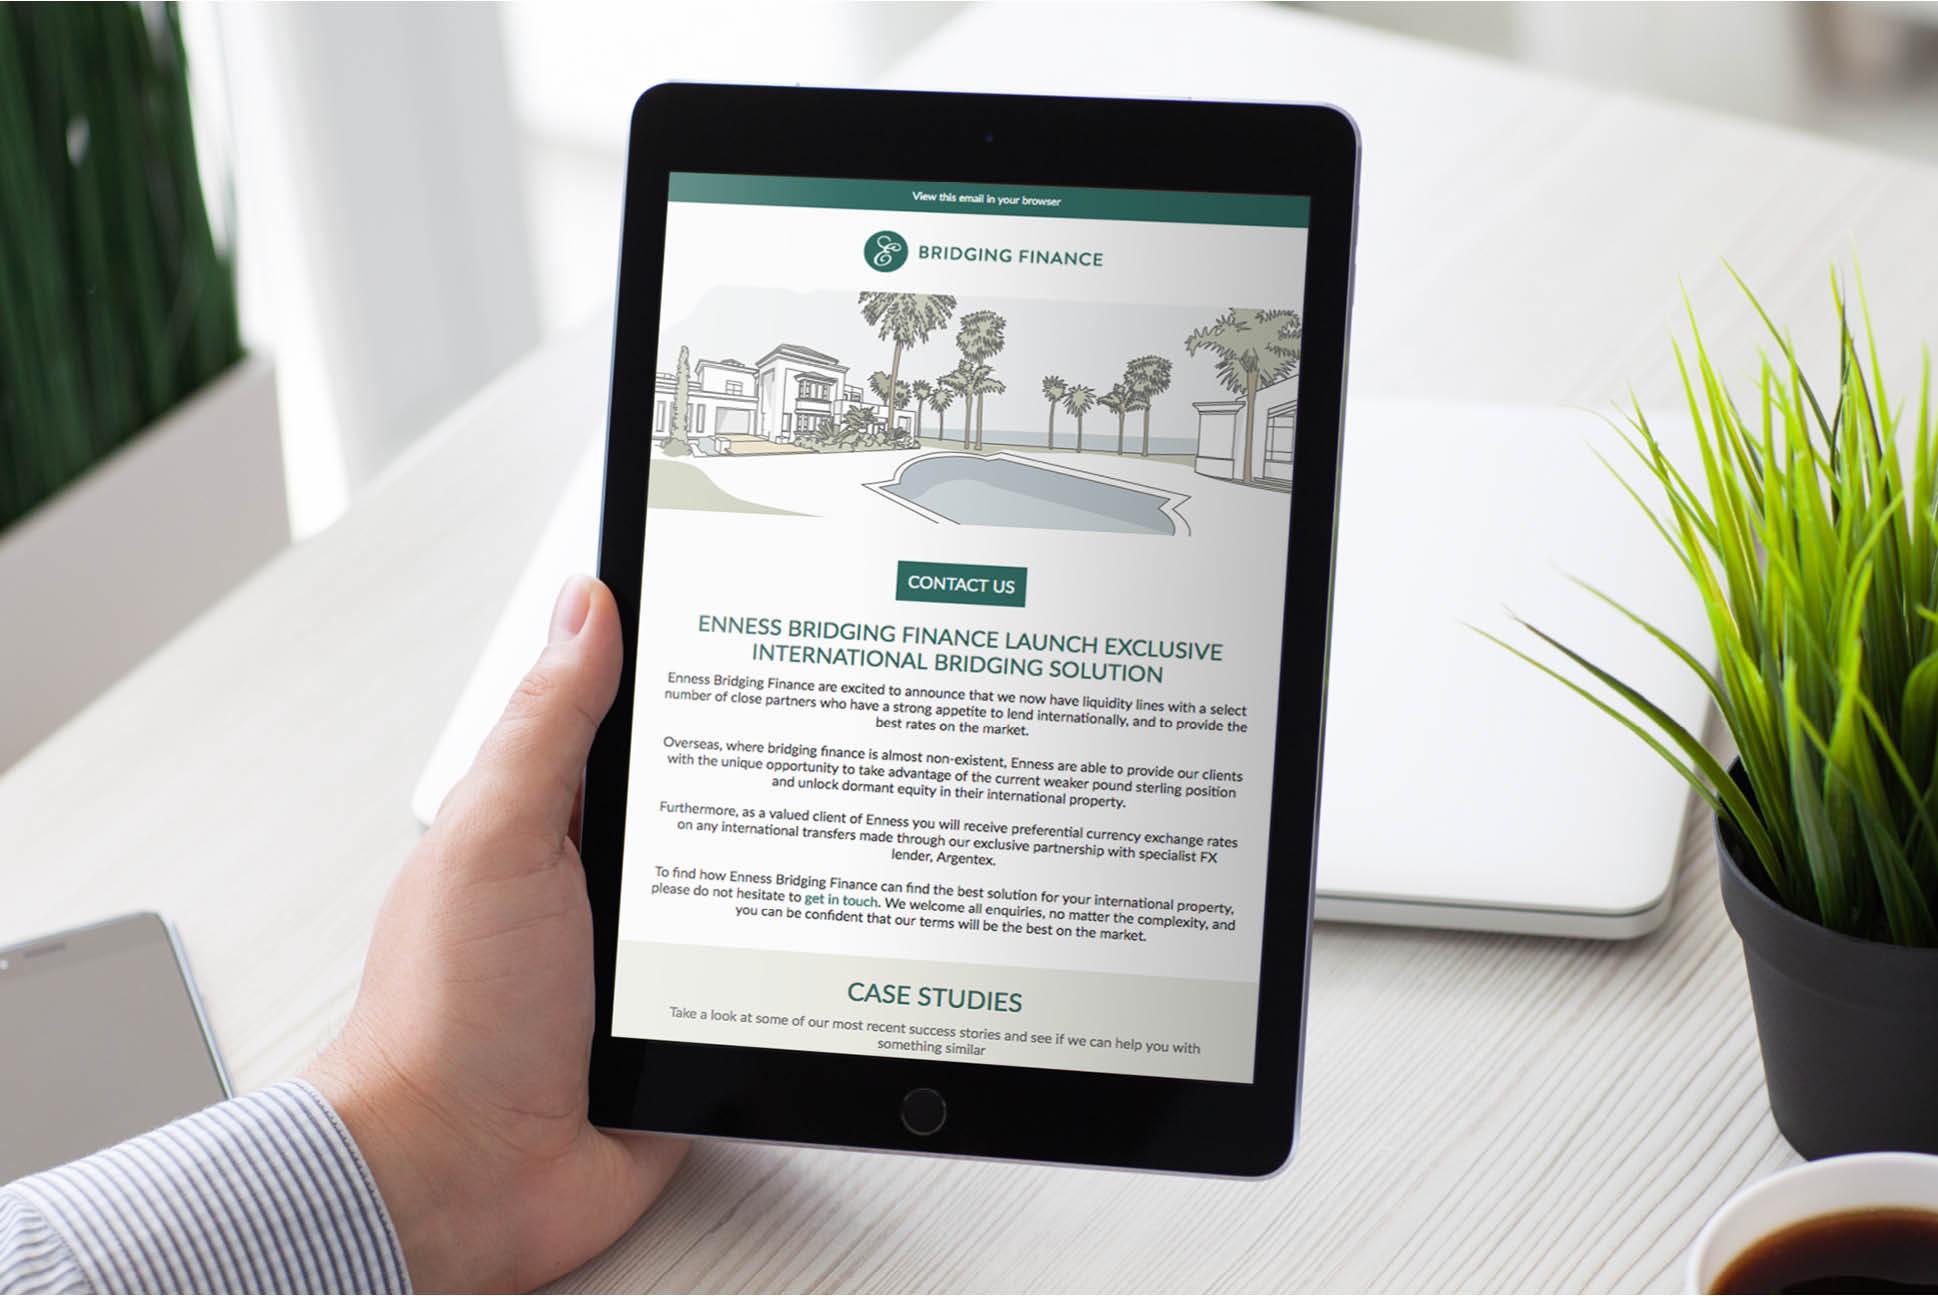 Enness Bridging email   Enness Website   Independent Marketing Brand Audit and Branding Refresh Services   IM London